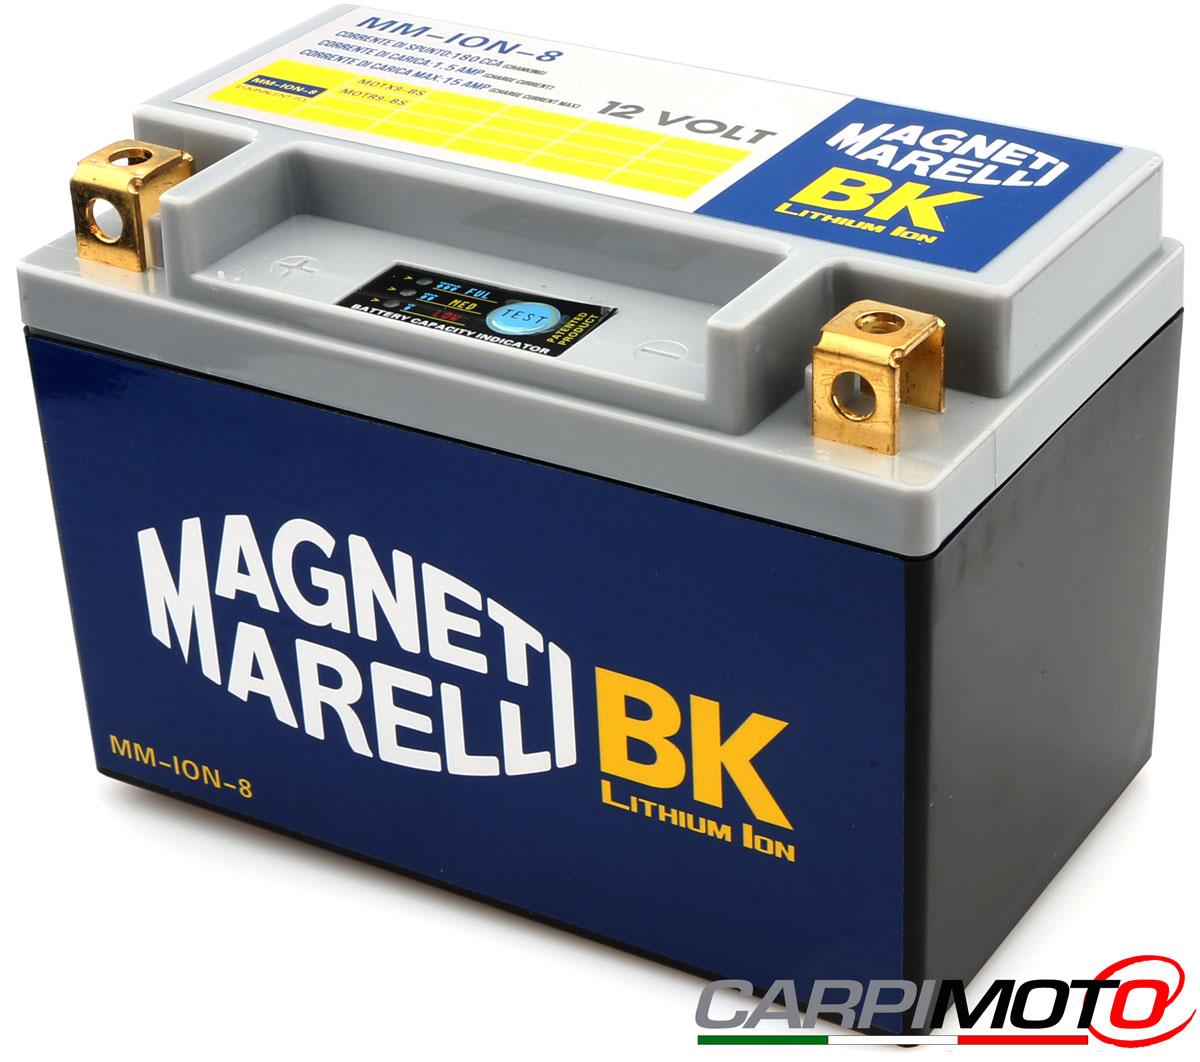 magneti marelli lithium battery mmyx9. Black Bedroom Furniture Sets. Home Design Ideas